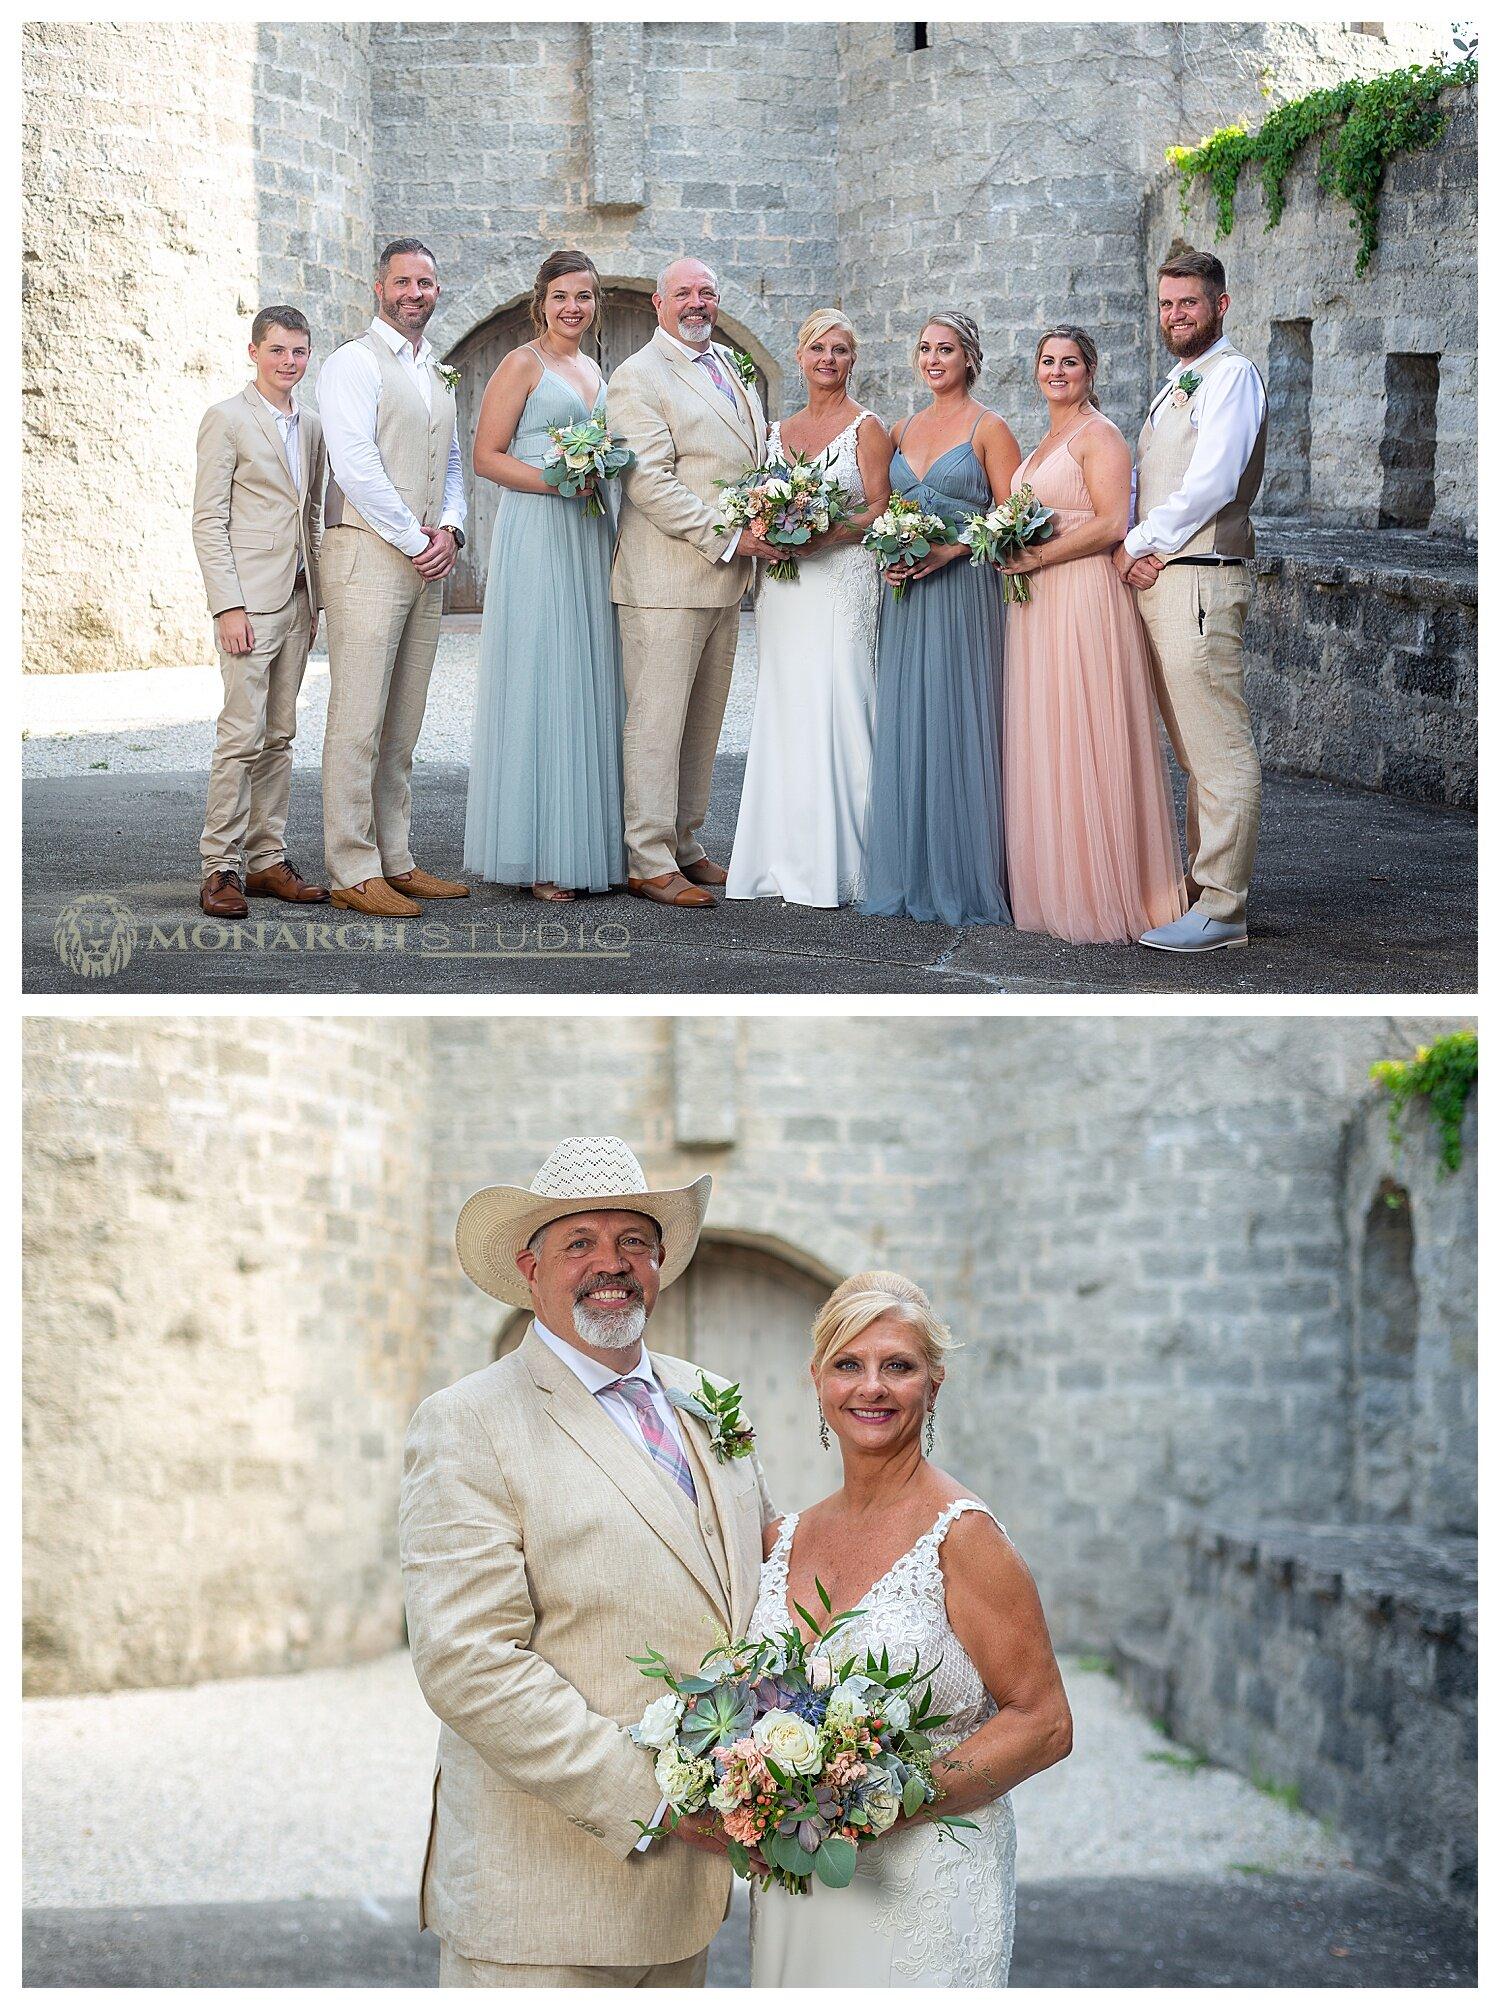 Florida Castle Wedding - St. Augustine 022.JPG